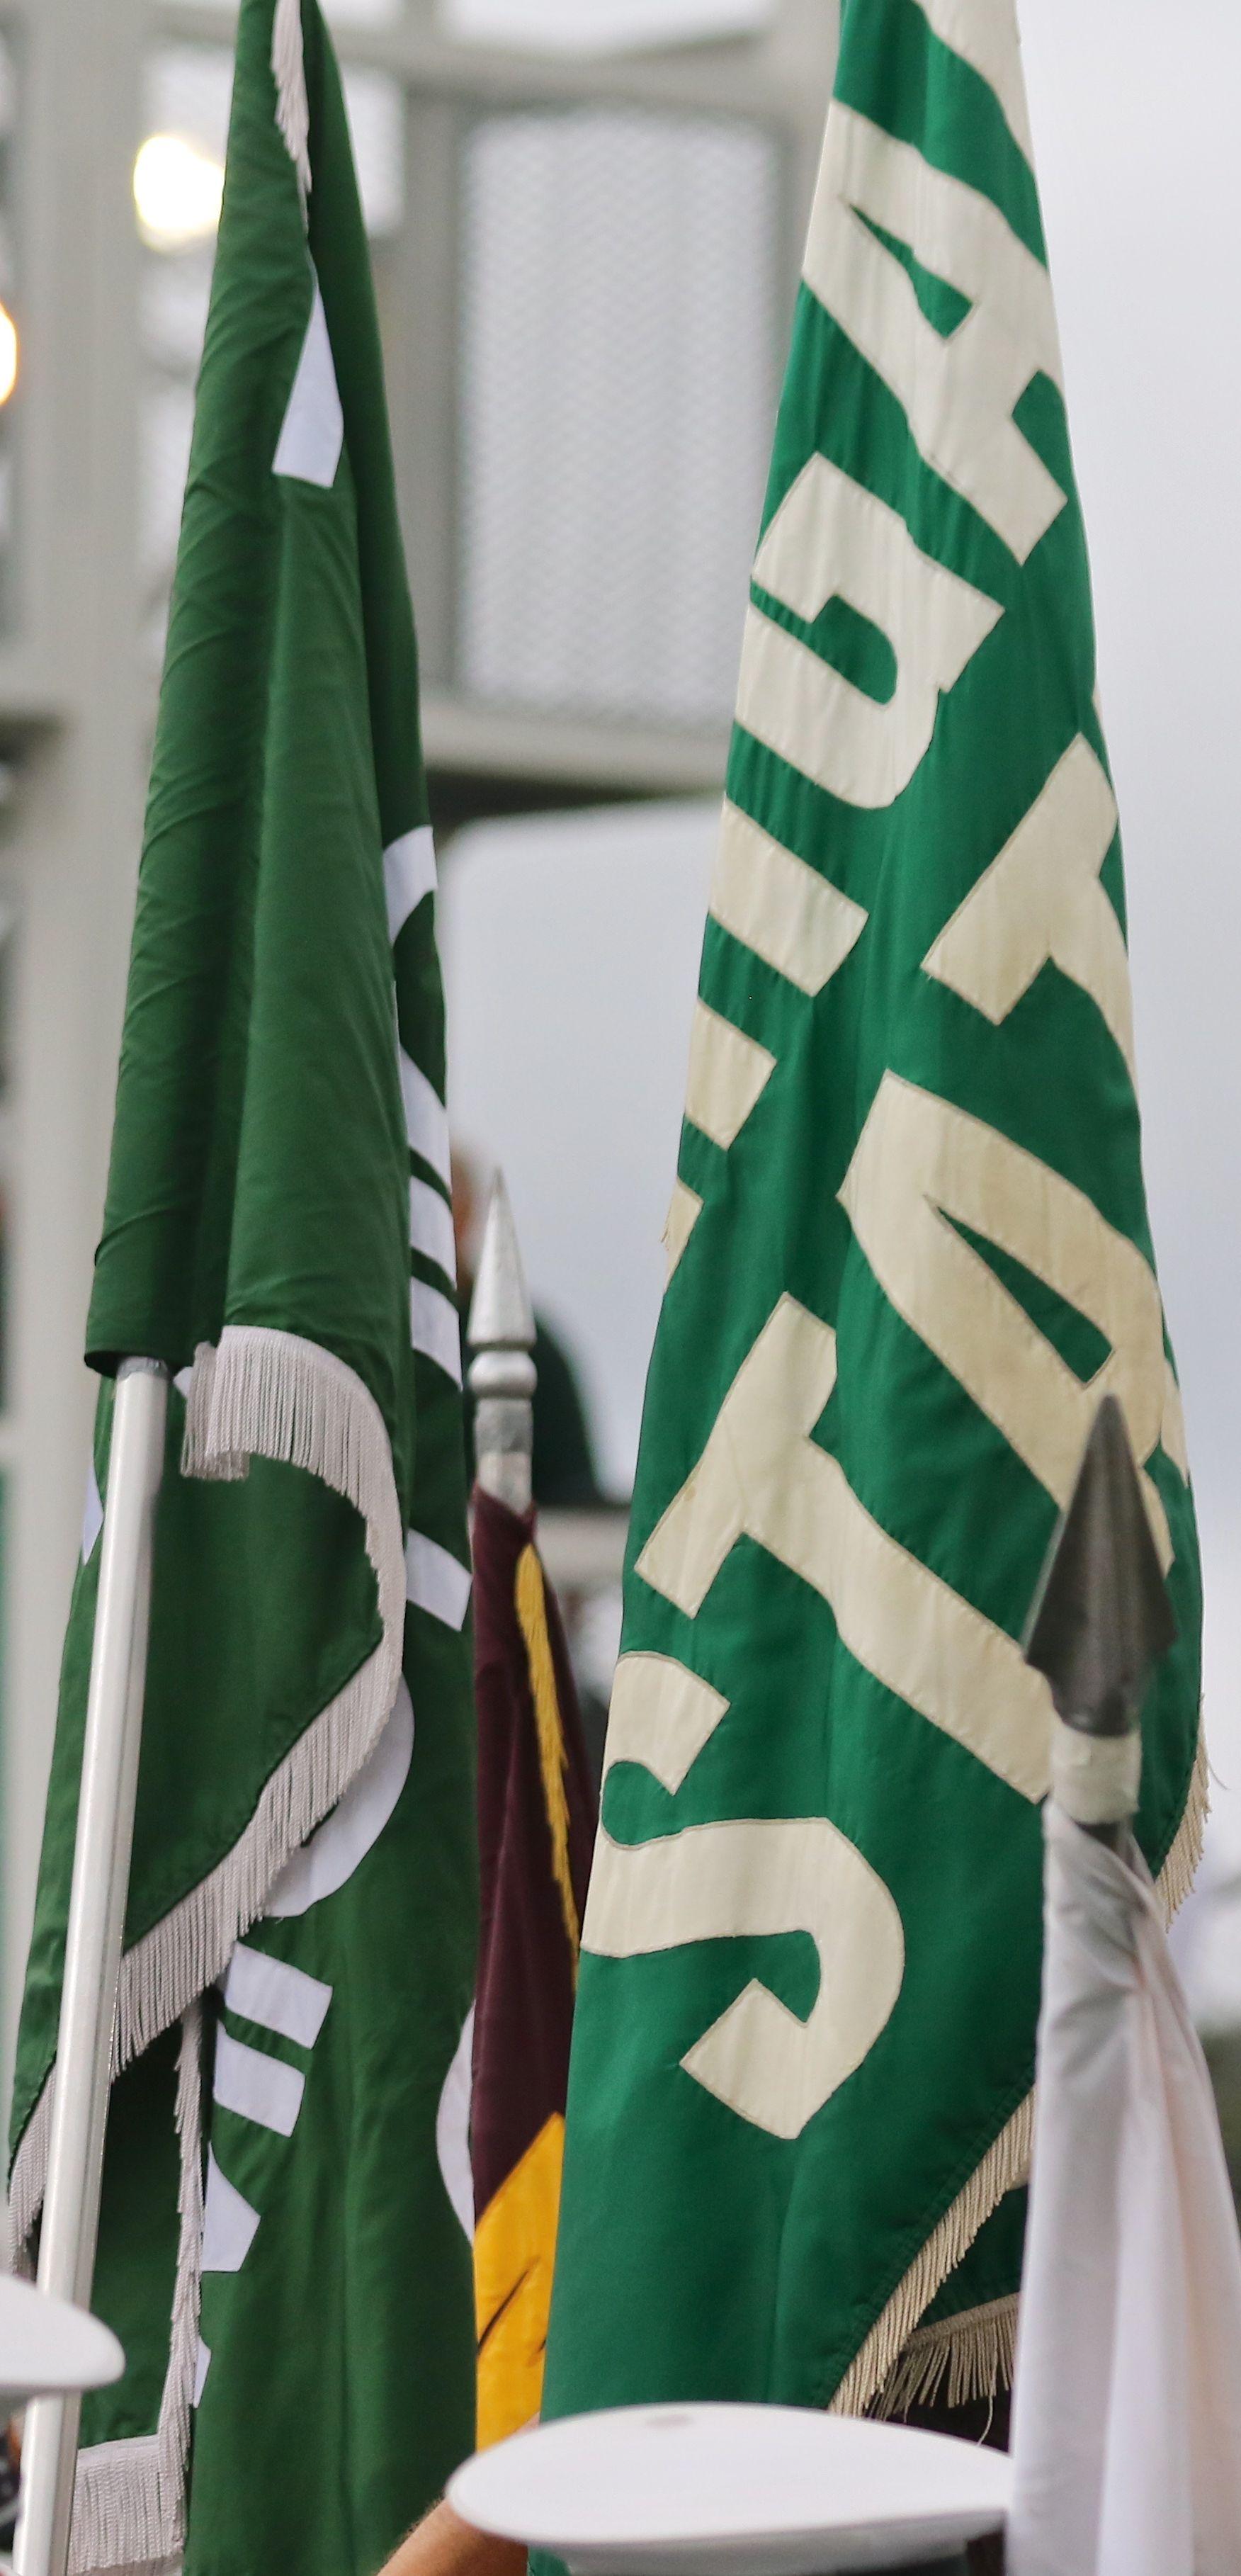 MSU Flags